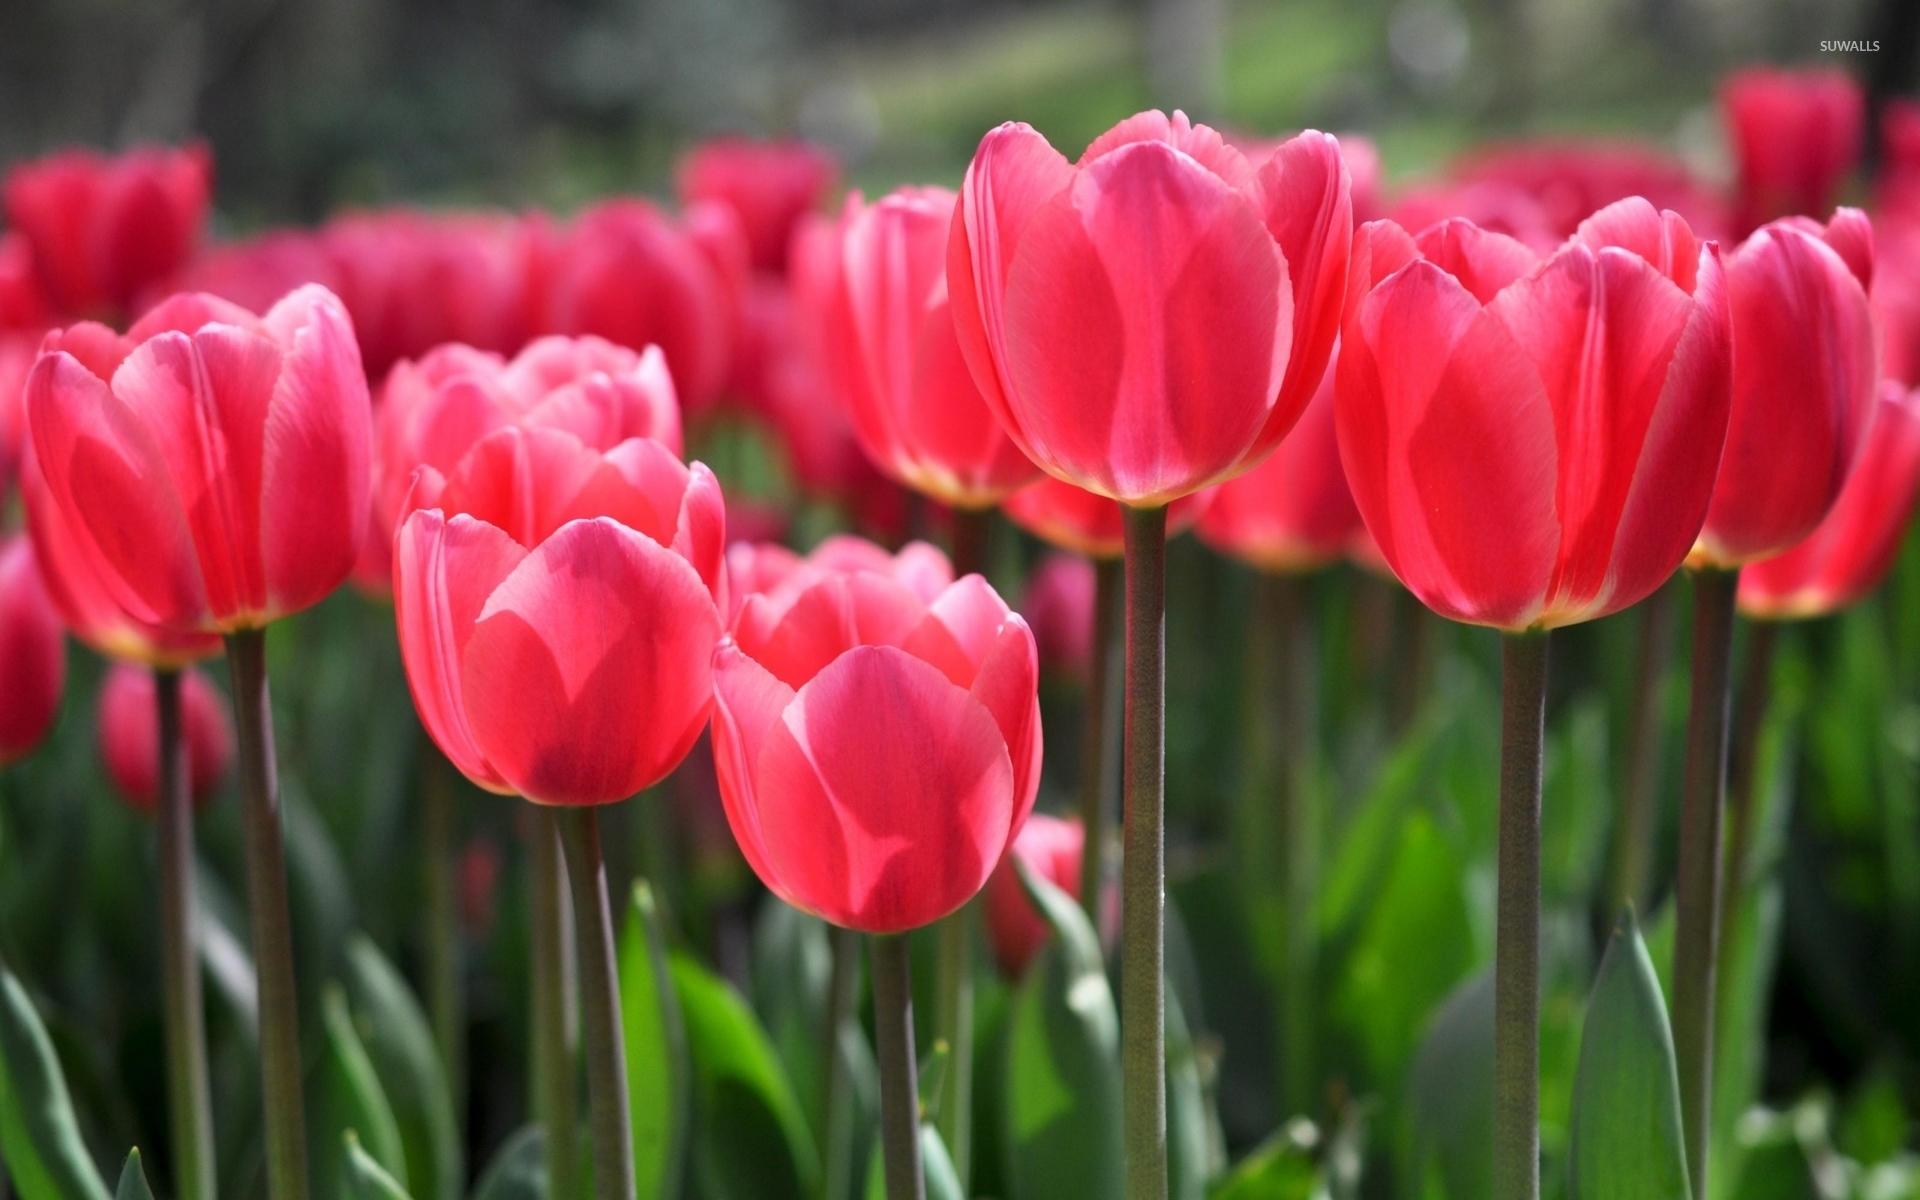 pink tulips wallpaper wallpapers - photo #14